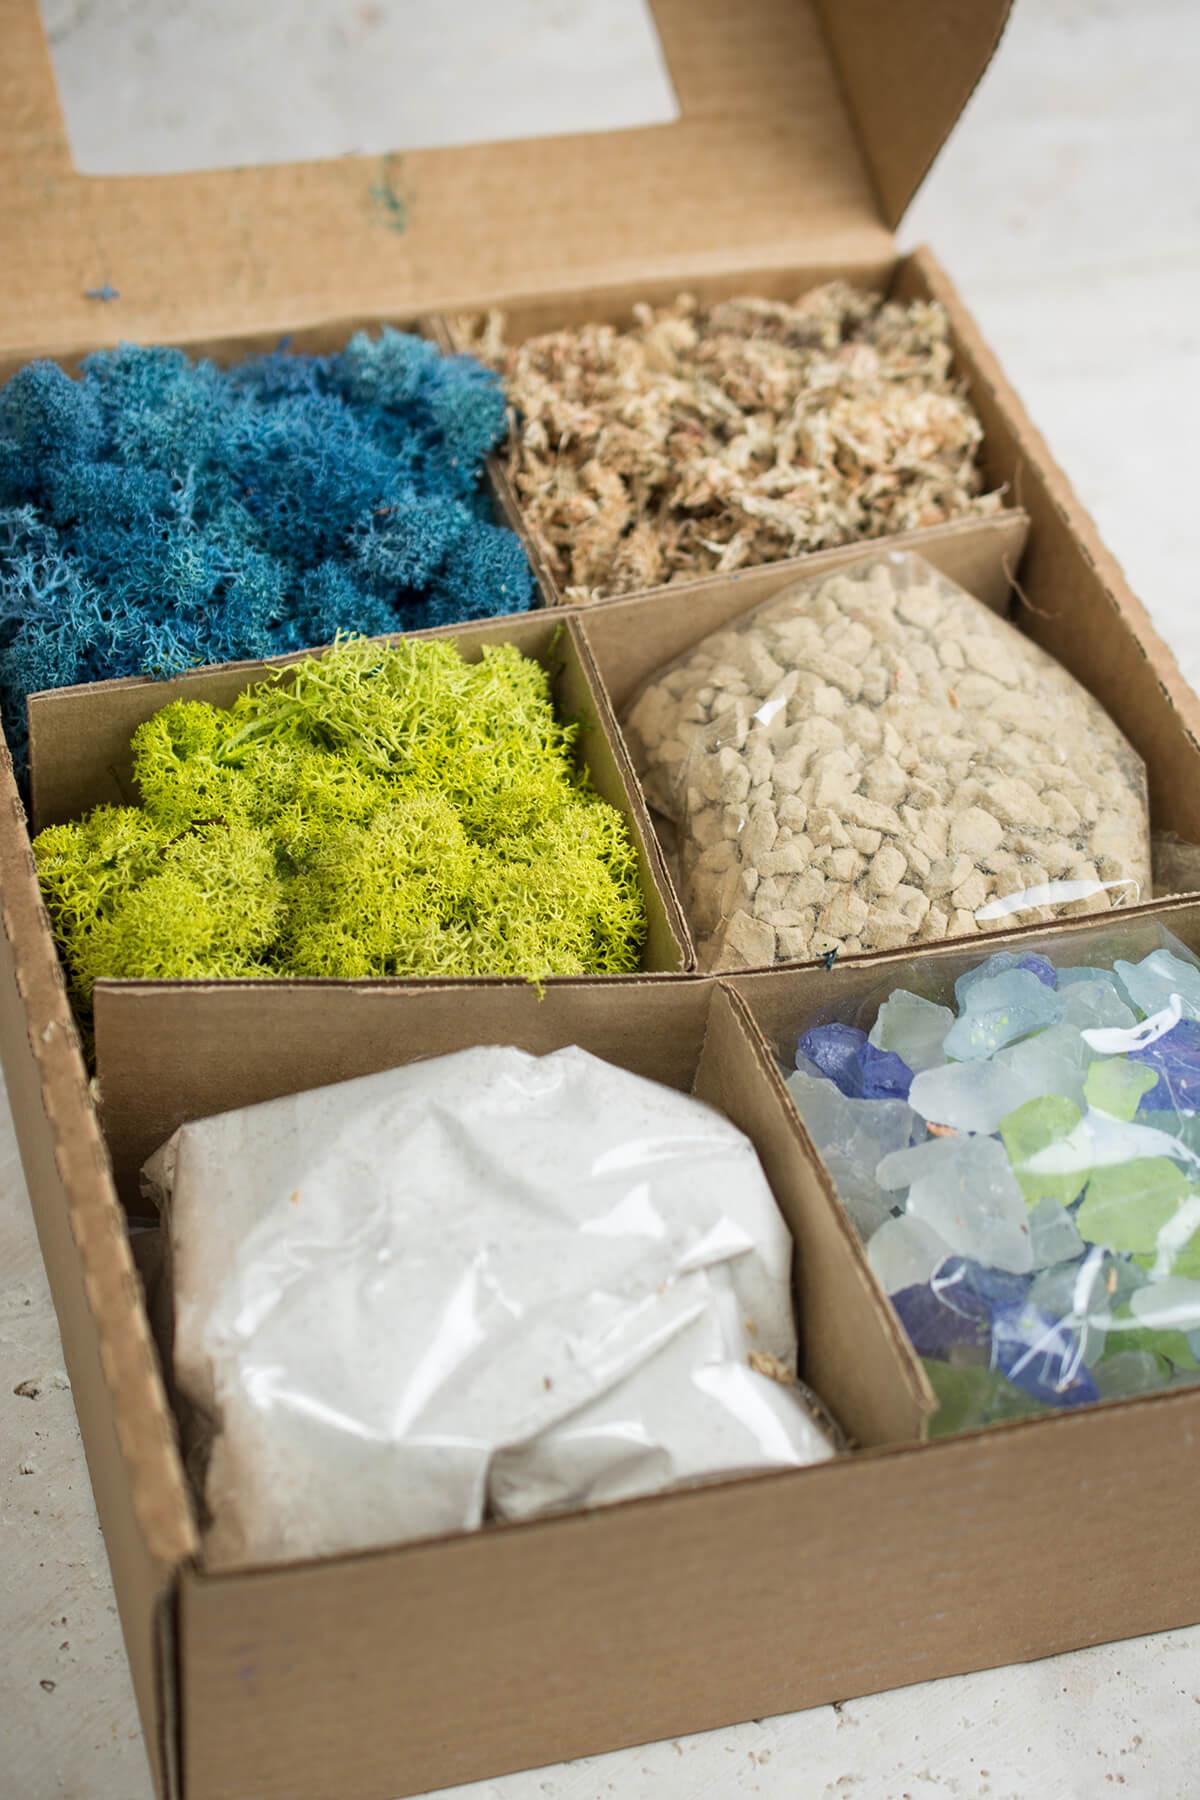 Terrarium Kit with Sand, Gravel, Mosses, & Sea Glass